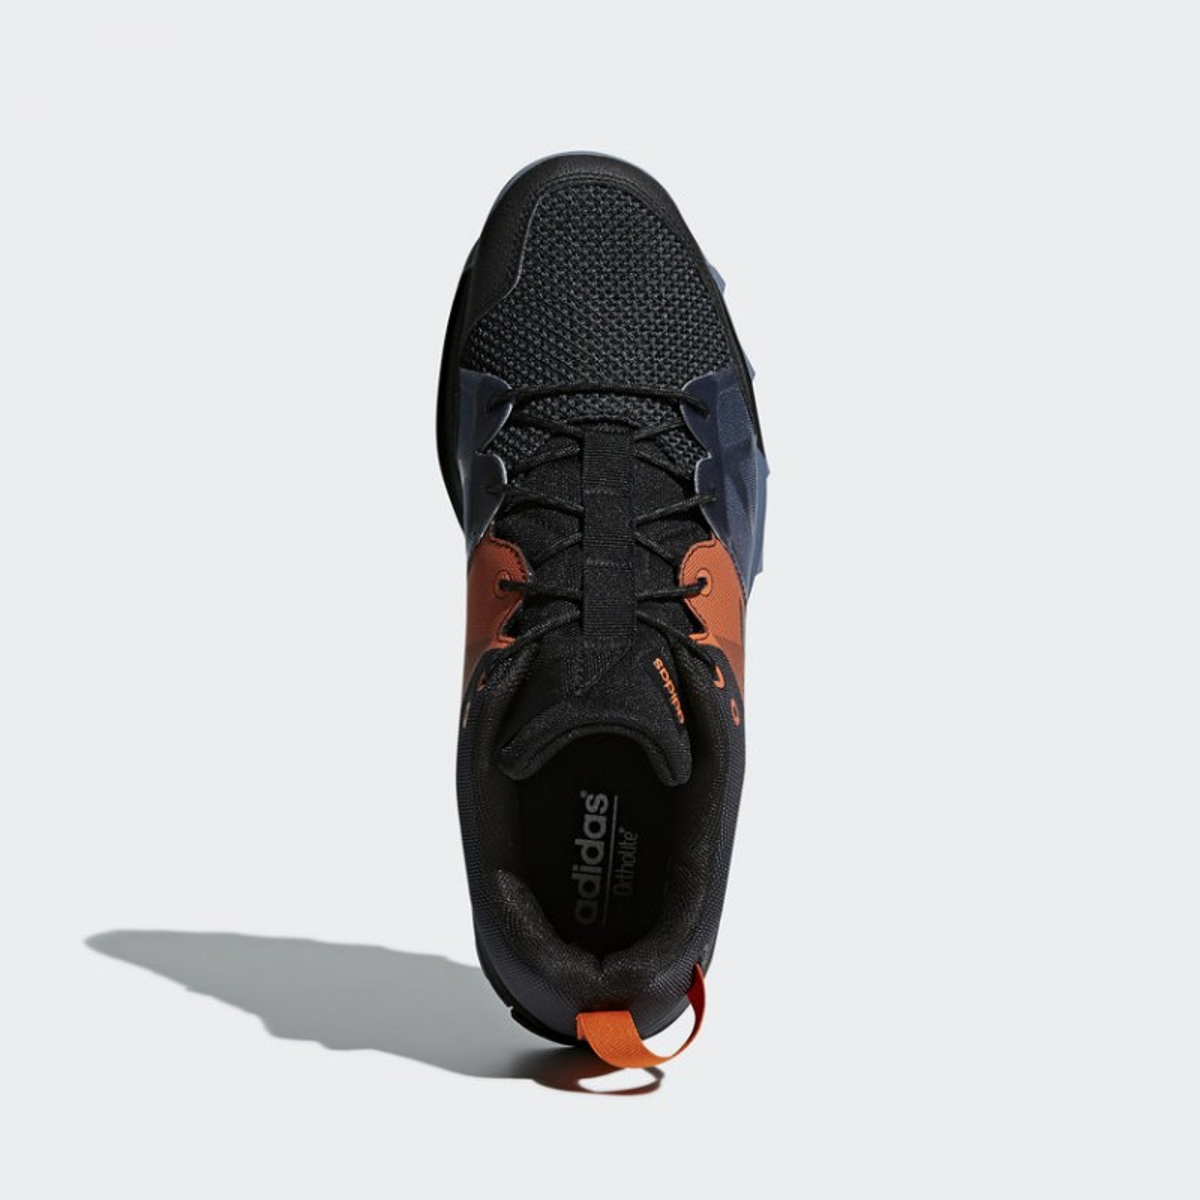 Verter Comedia de enredo deseable  Zapatillas Adidas Kanadia 8.1 Trail Hombre PV18 Negro/Naranja - 365 Rider